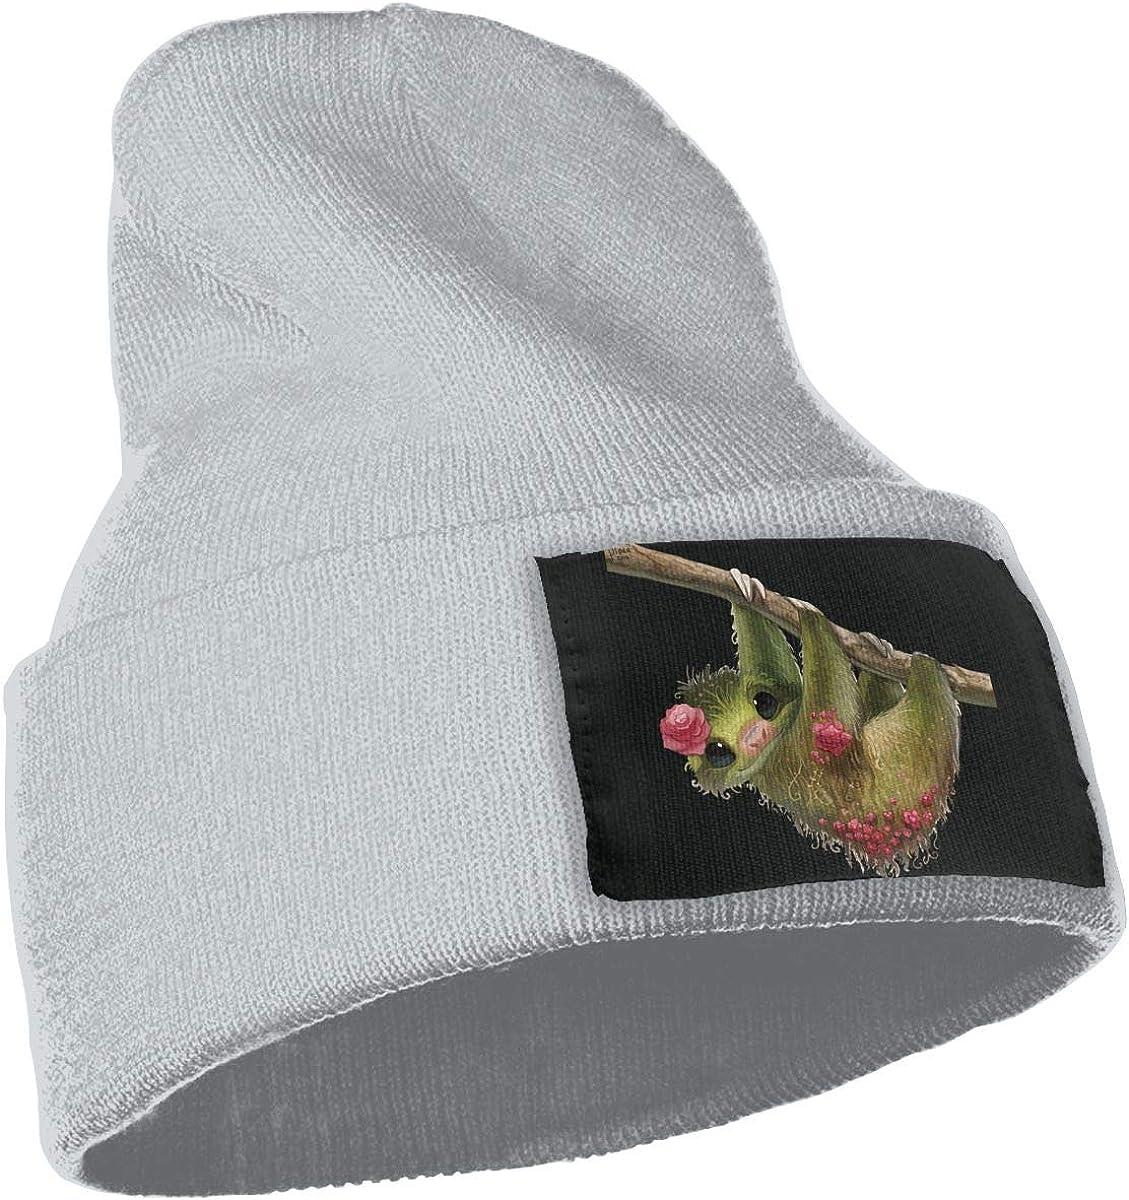 SLADDD1 Elegant Sloth Warm Winter Hat Knit Beanie Skull Cap Cuff Beanie Hat Winter Hats for Men /& Women